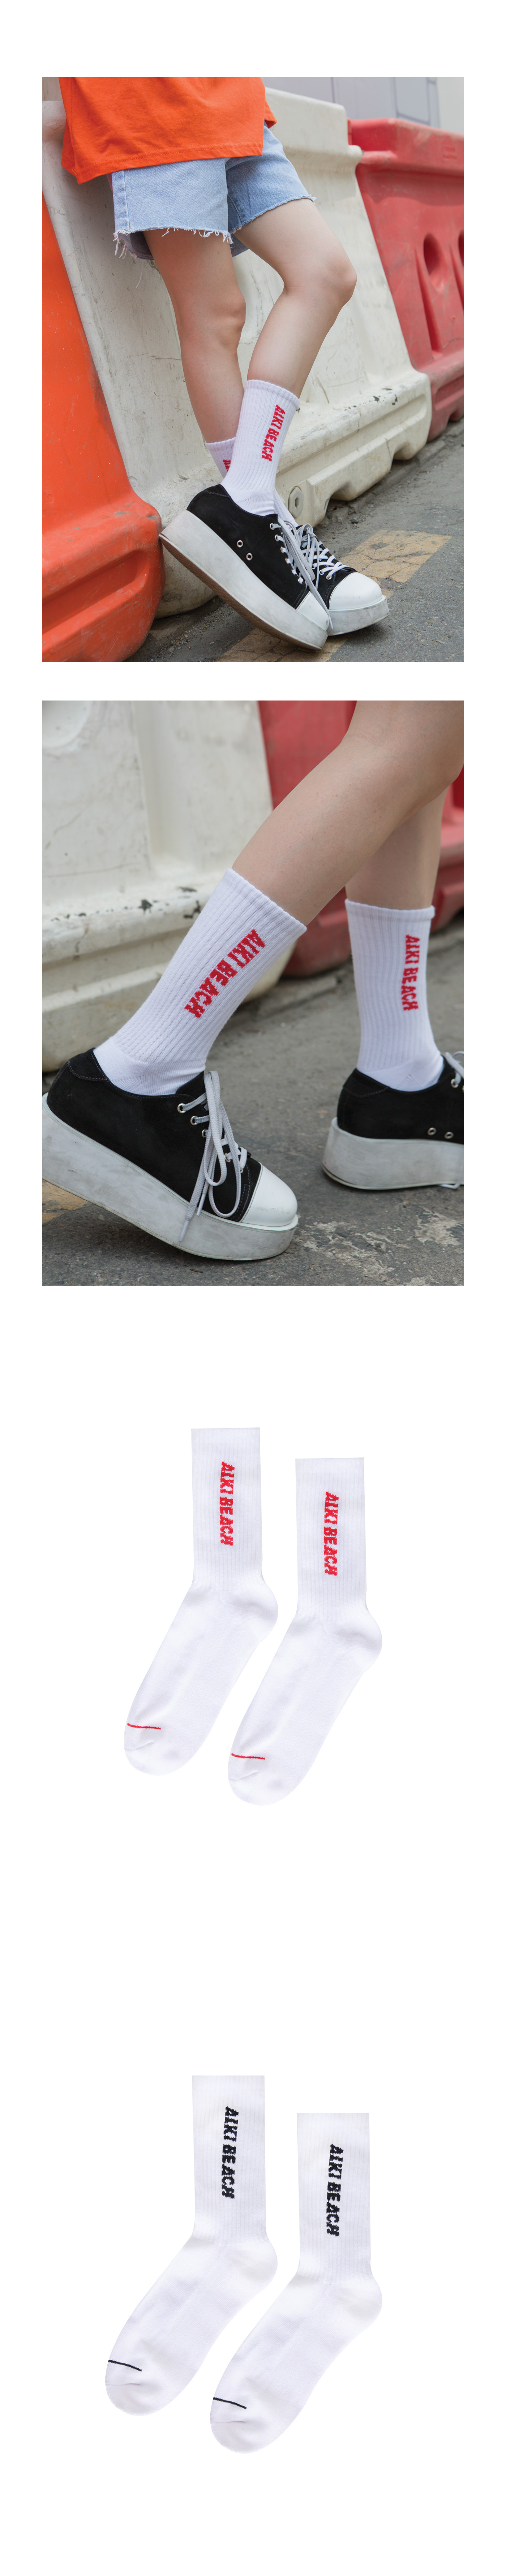 SALE aiki beach socks